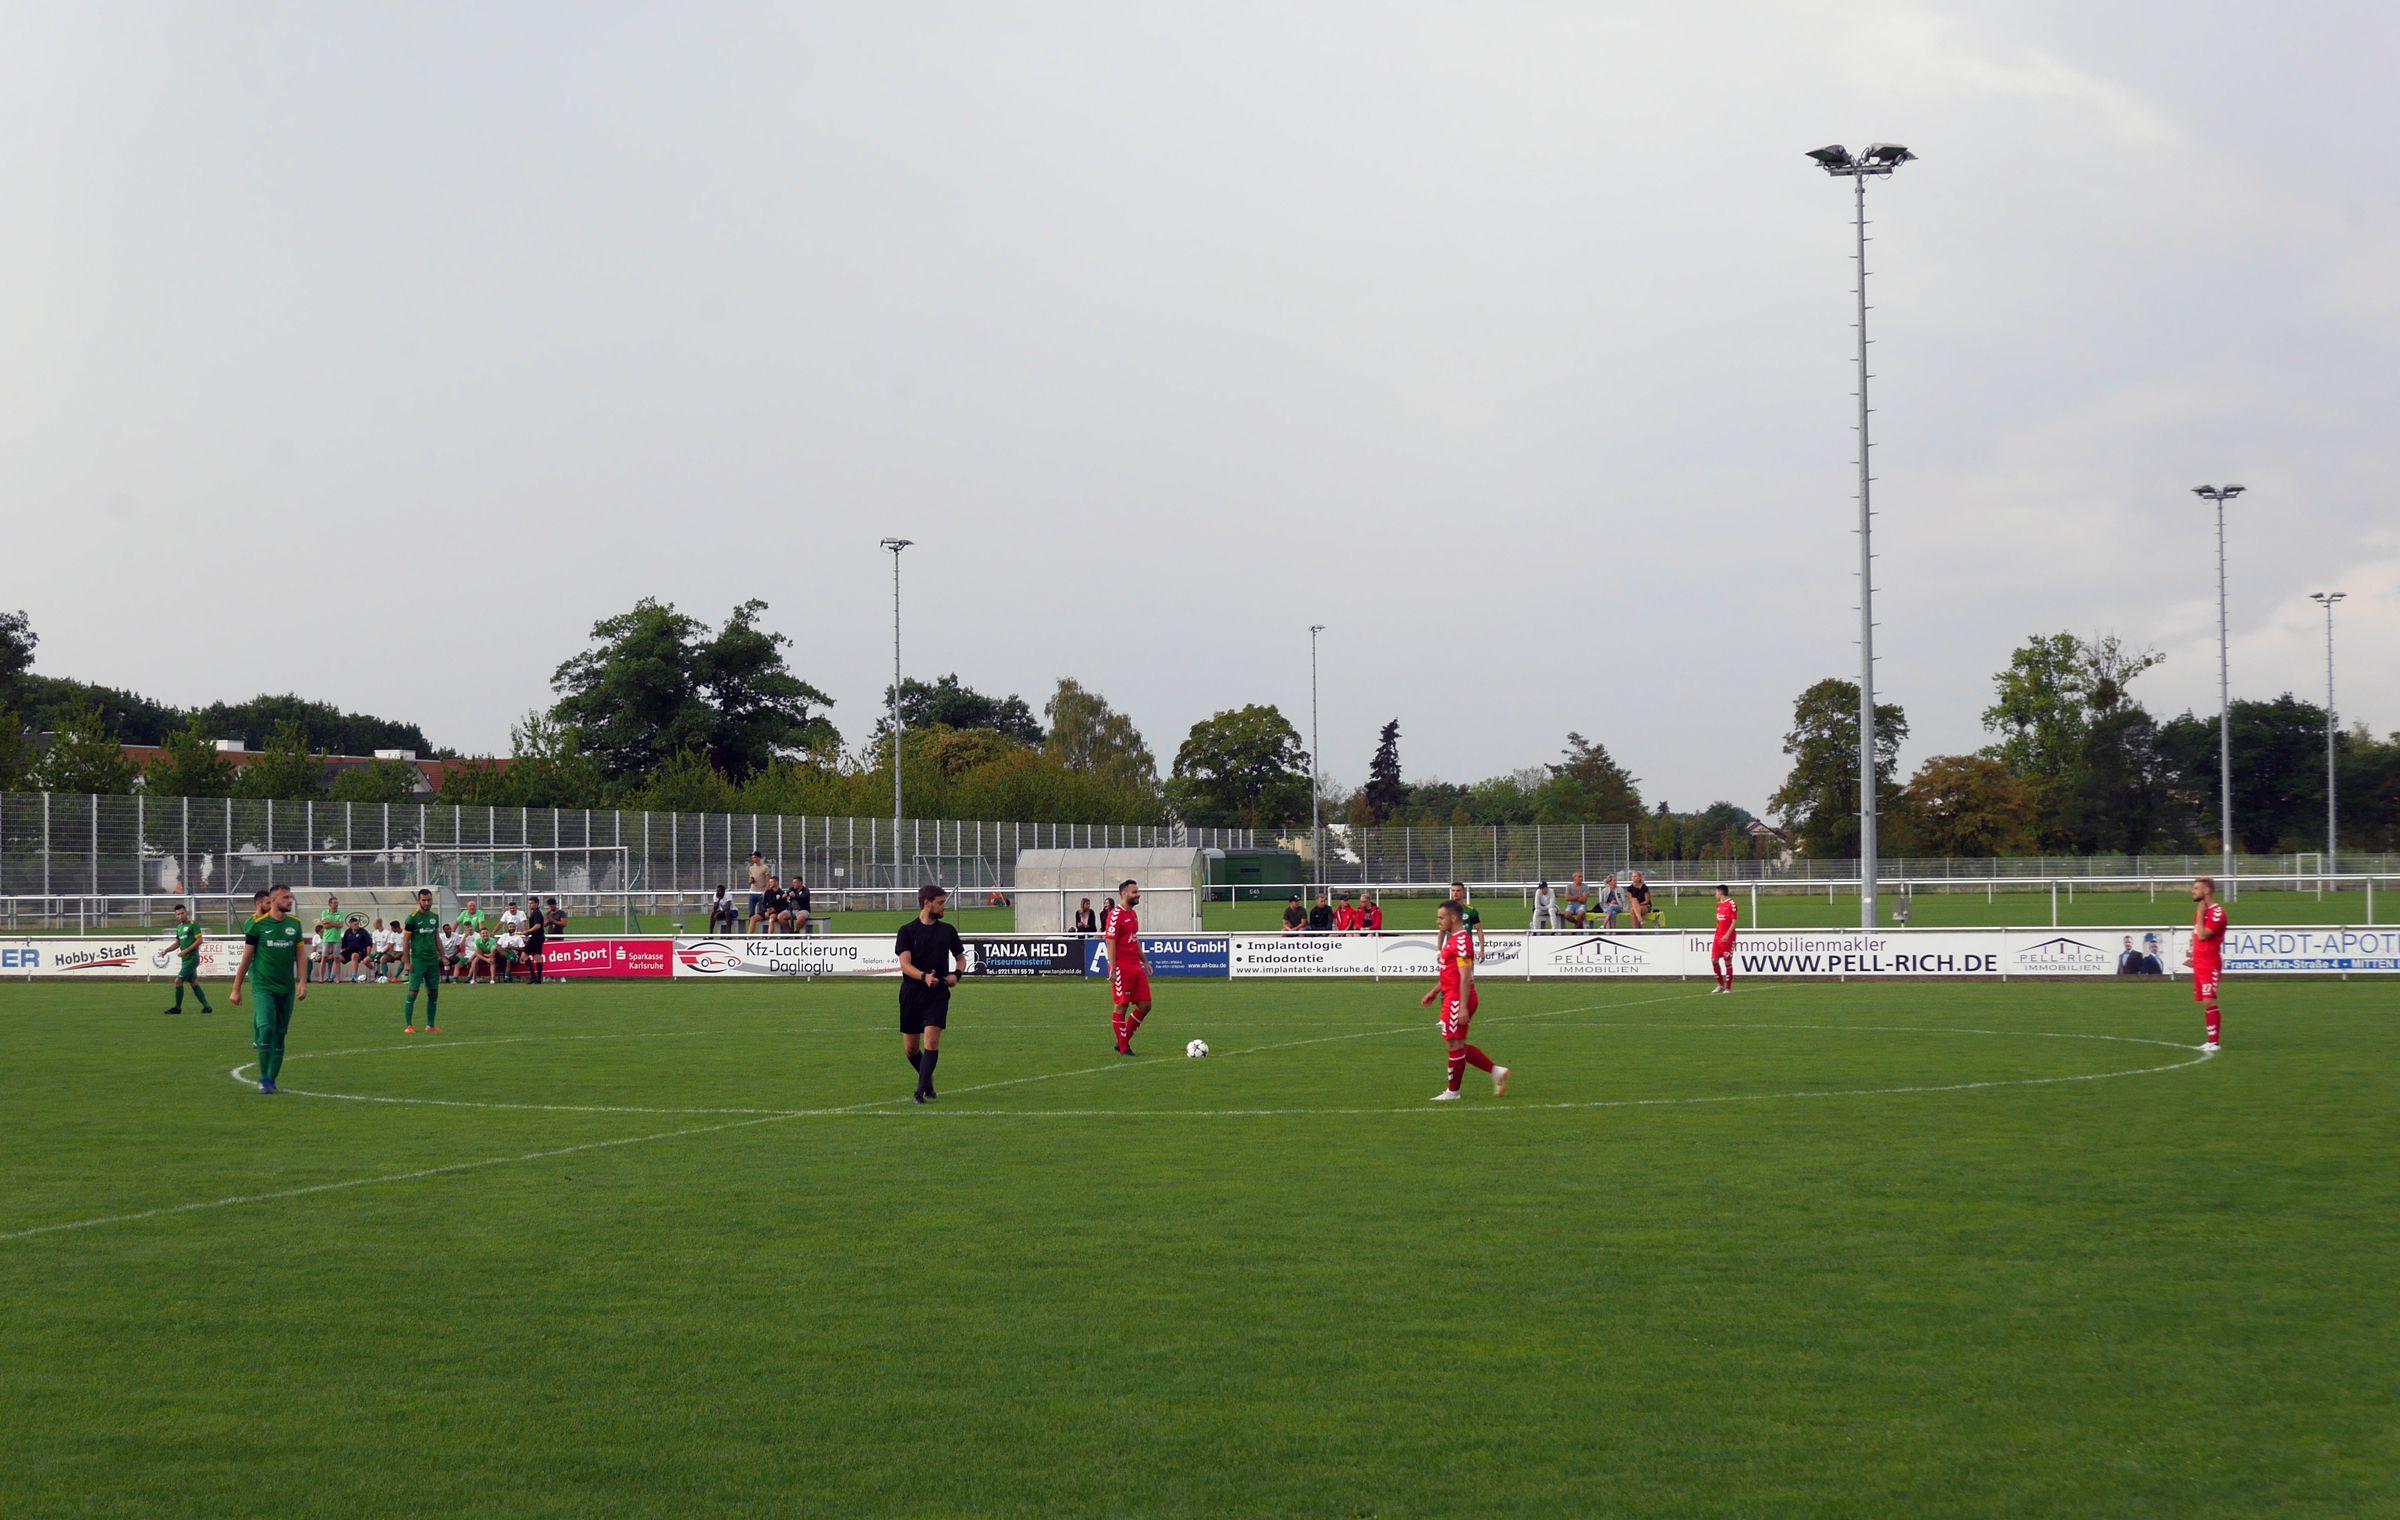 Anstoß zur Landesliga 18/19!